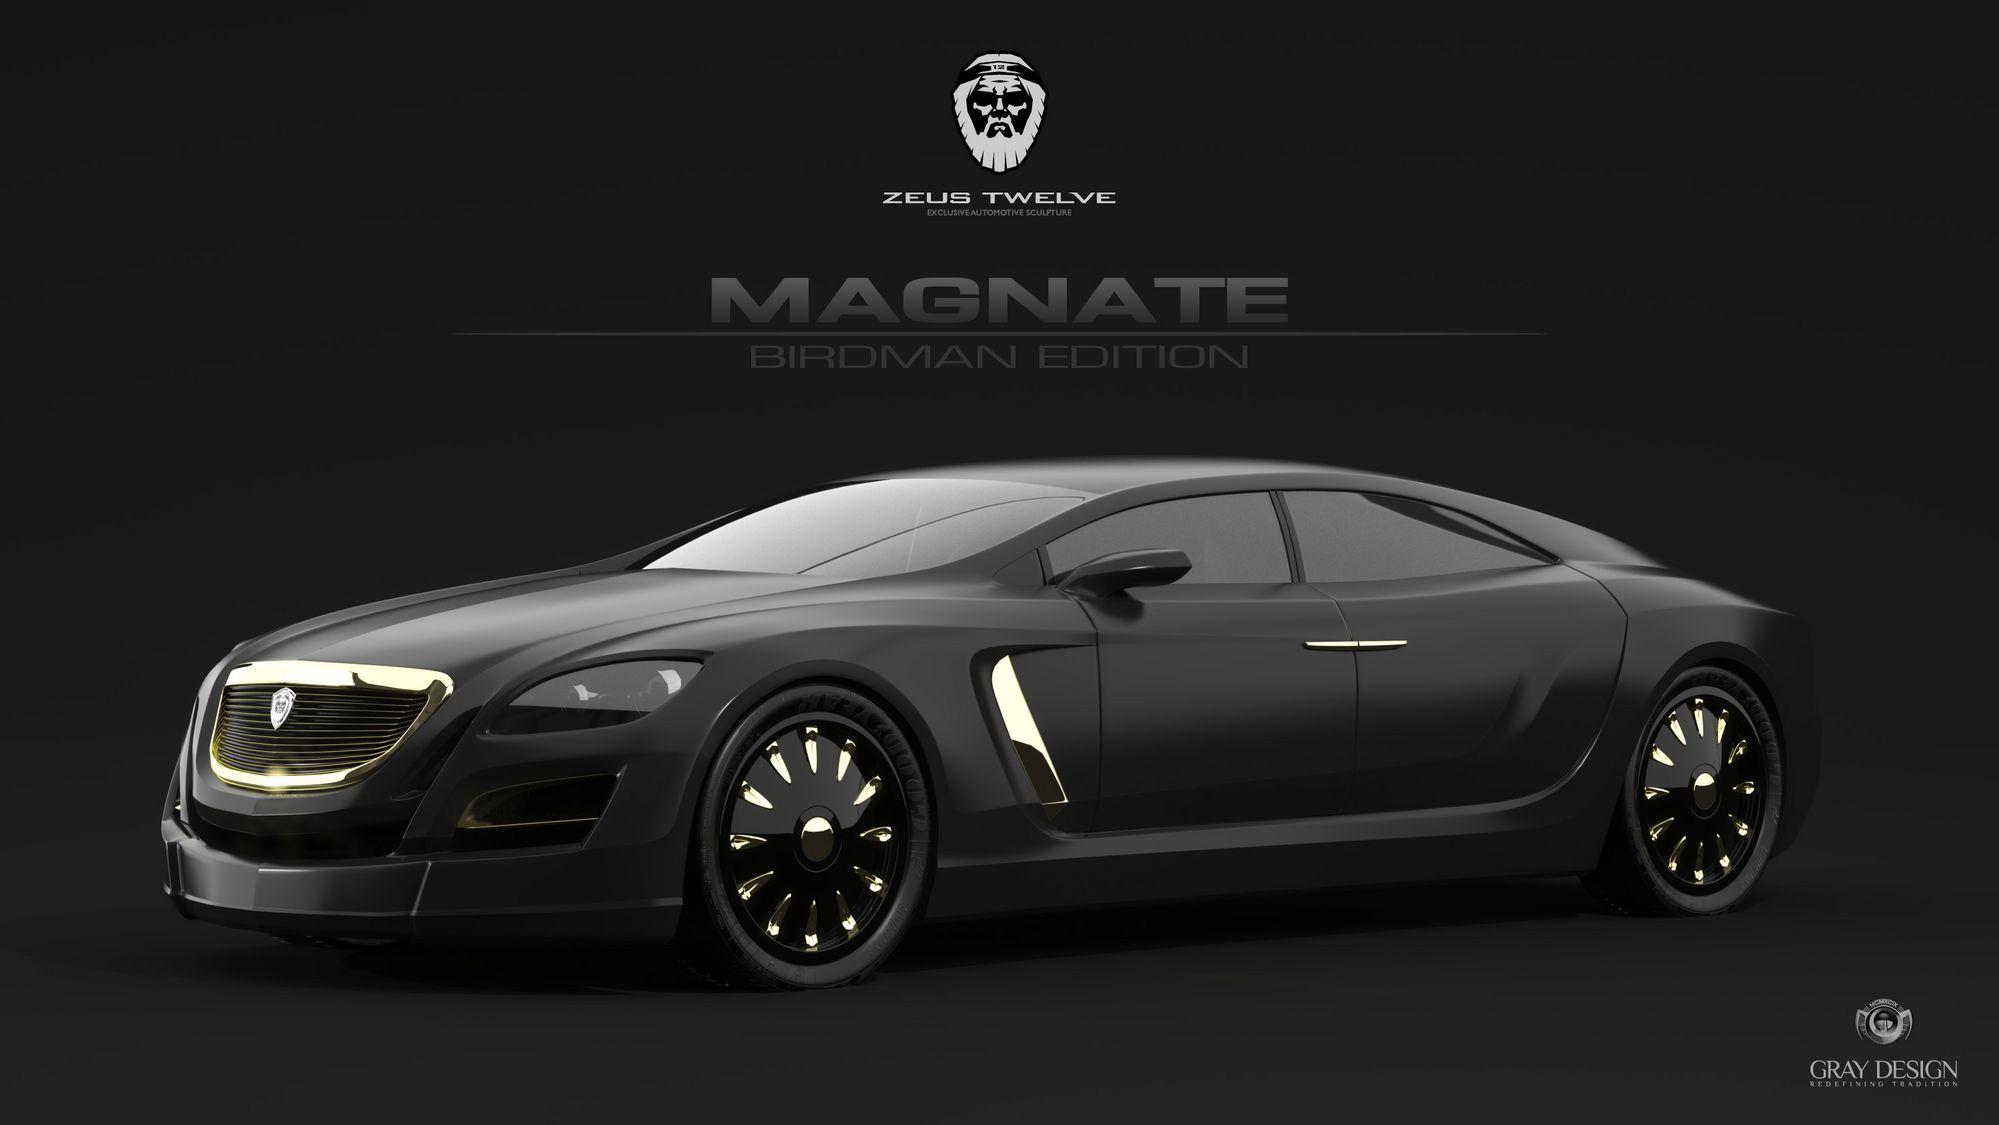 Zeus Twelve By Grey Design V8 De Bentley Super Cars Supercar Design Luxury Cars